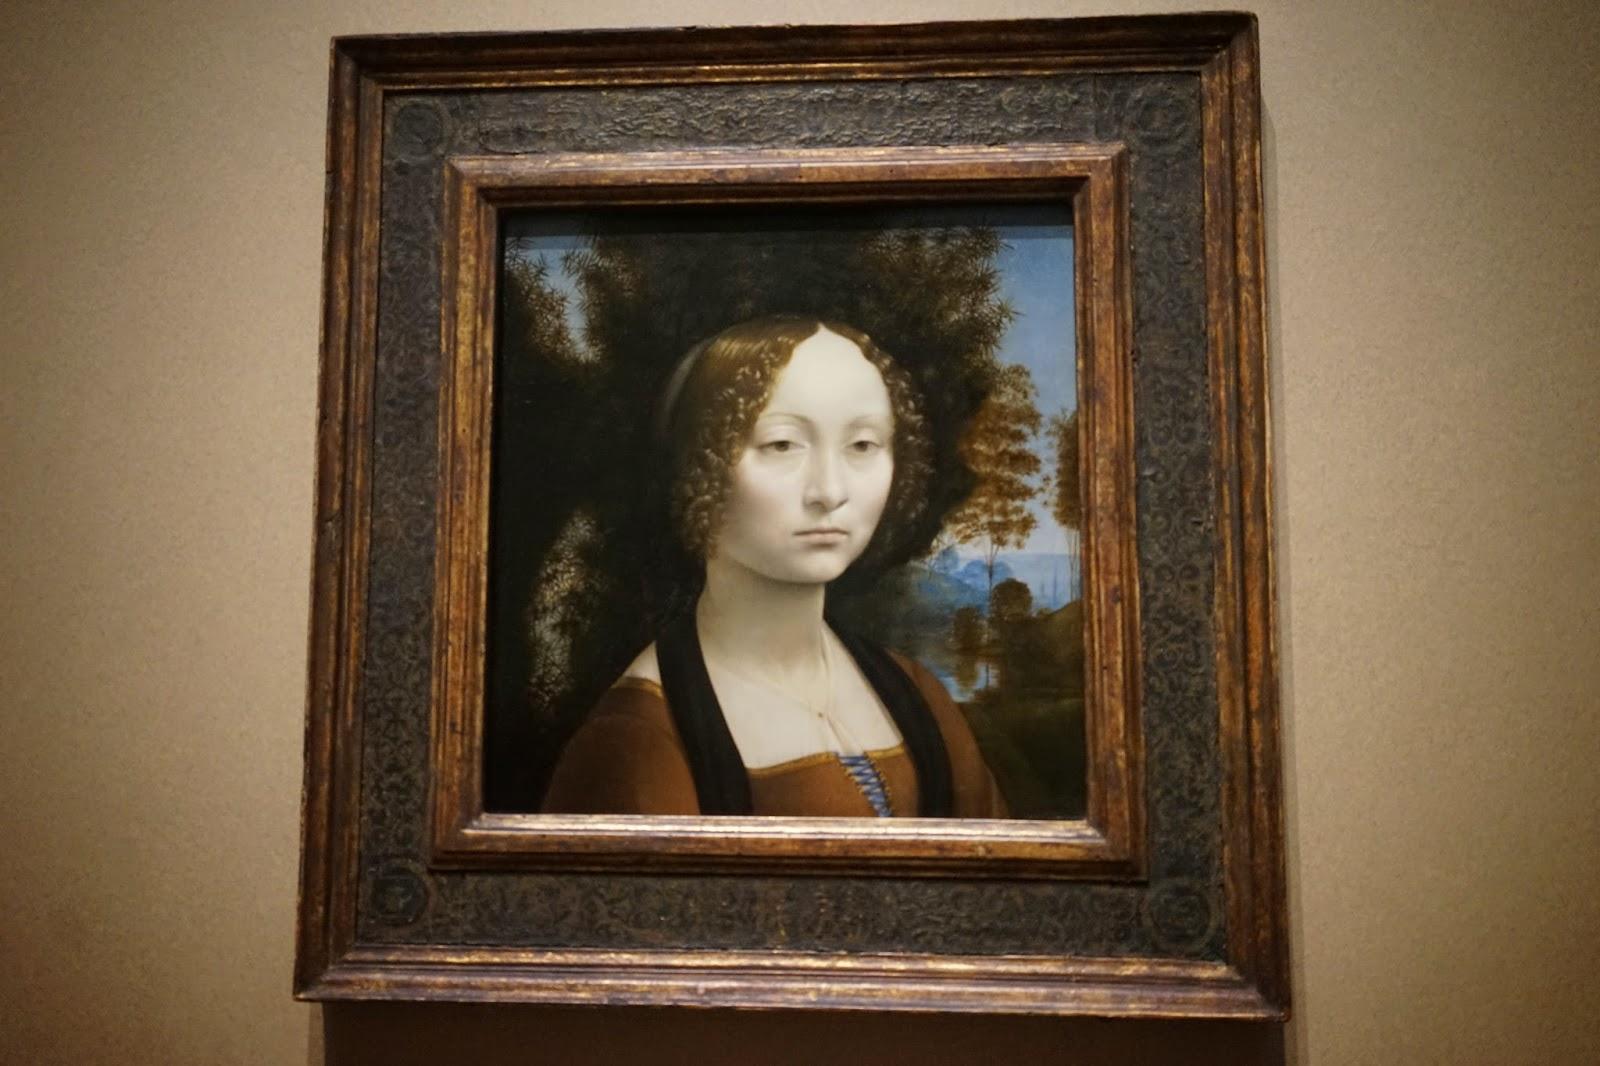 national gallery of art washington D.C Da Vinci